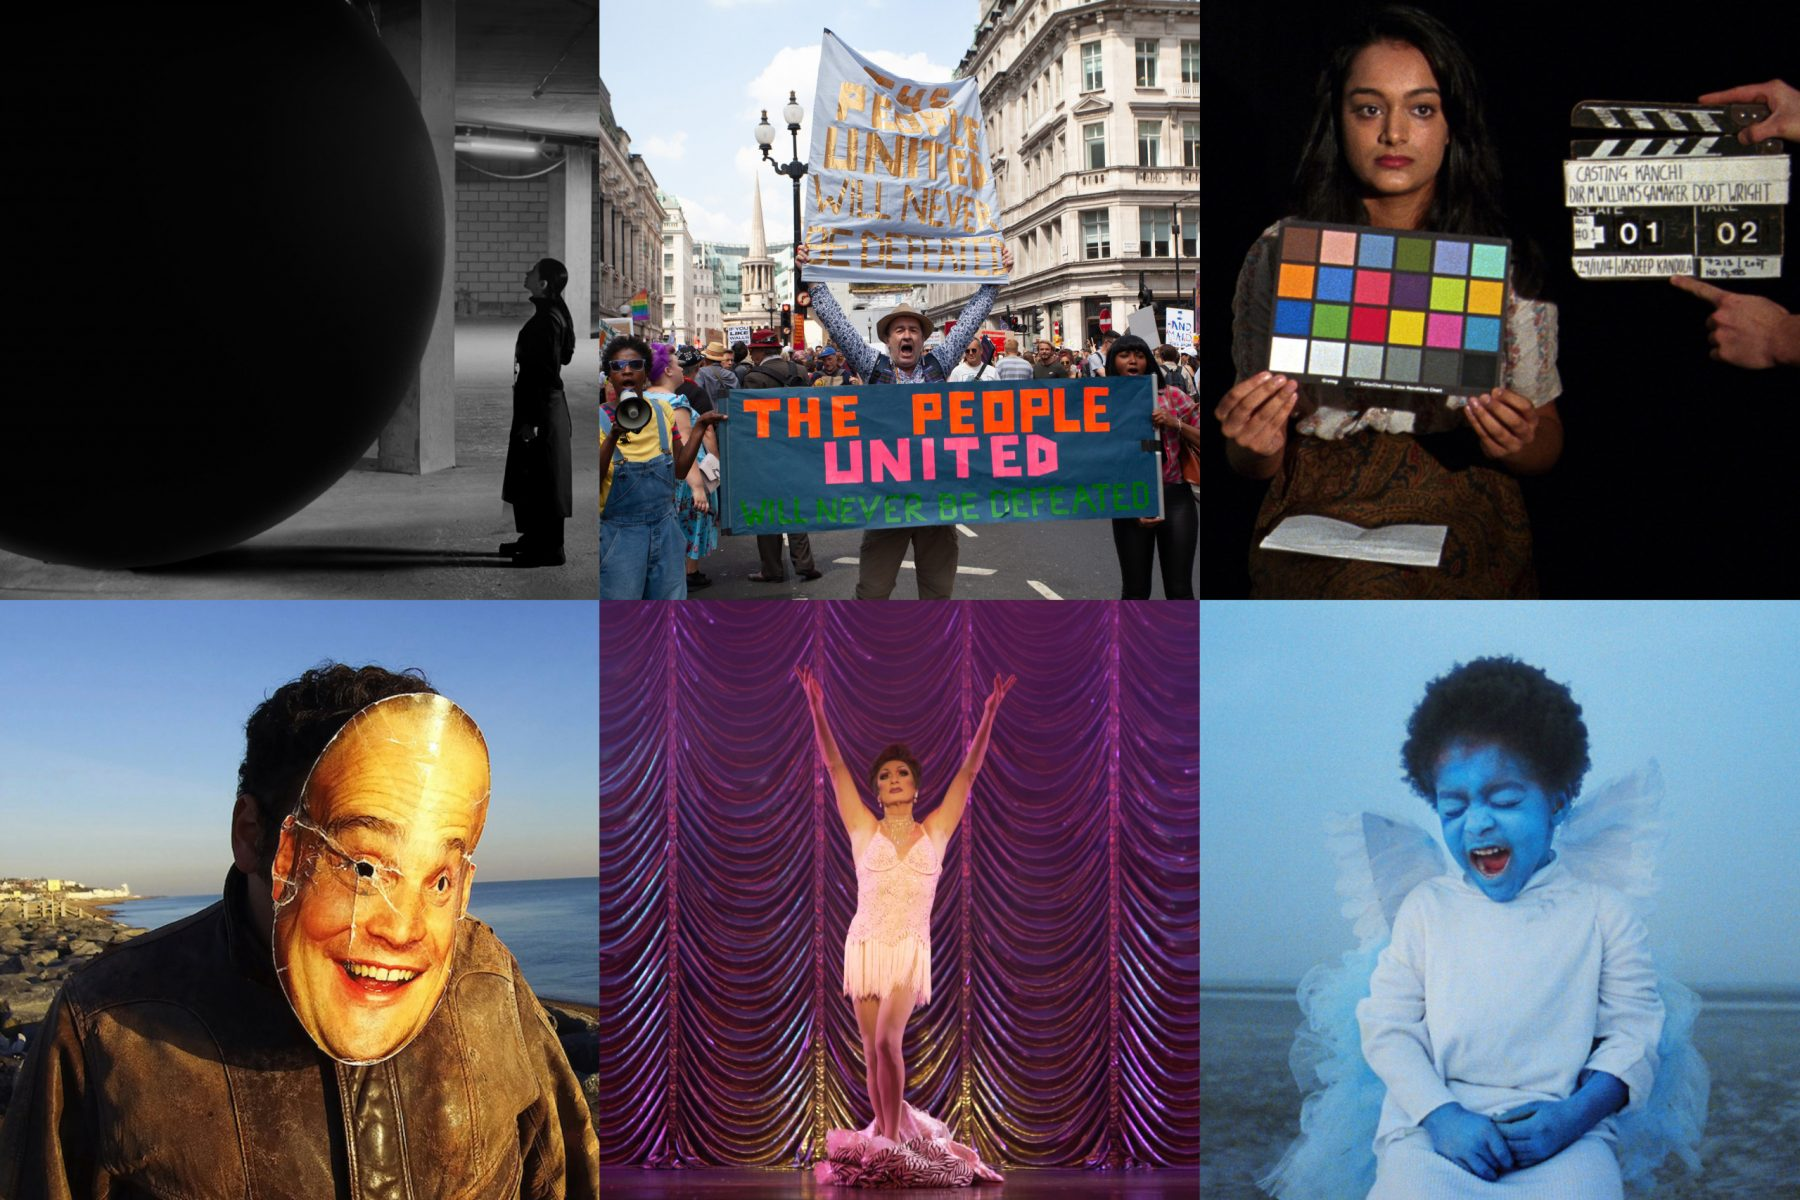 Film London Jarman Award 2020 shortlisted artists stills. Top row, left to right: Larissa Sansour, Andrea Luka Zimmerman, Michelle Williams Gamaker, Project Art Works, Hannah Quinlan and Rosie Hastings, Jenn Nkiru,